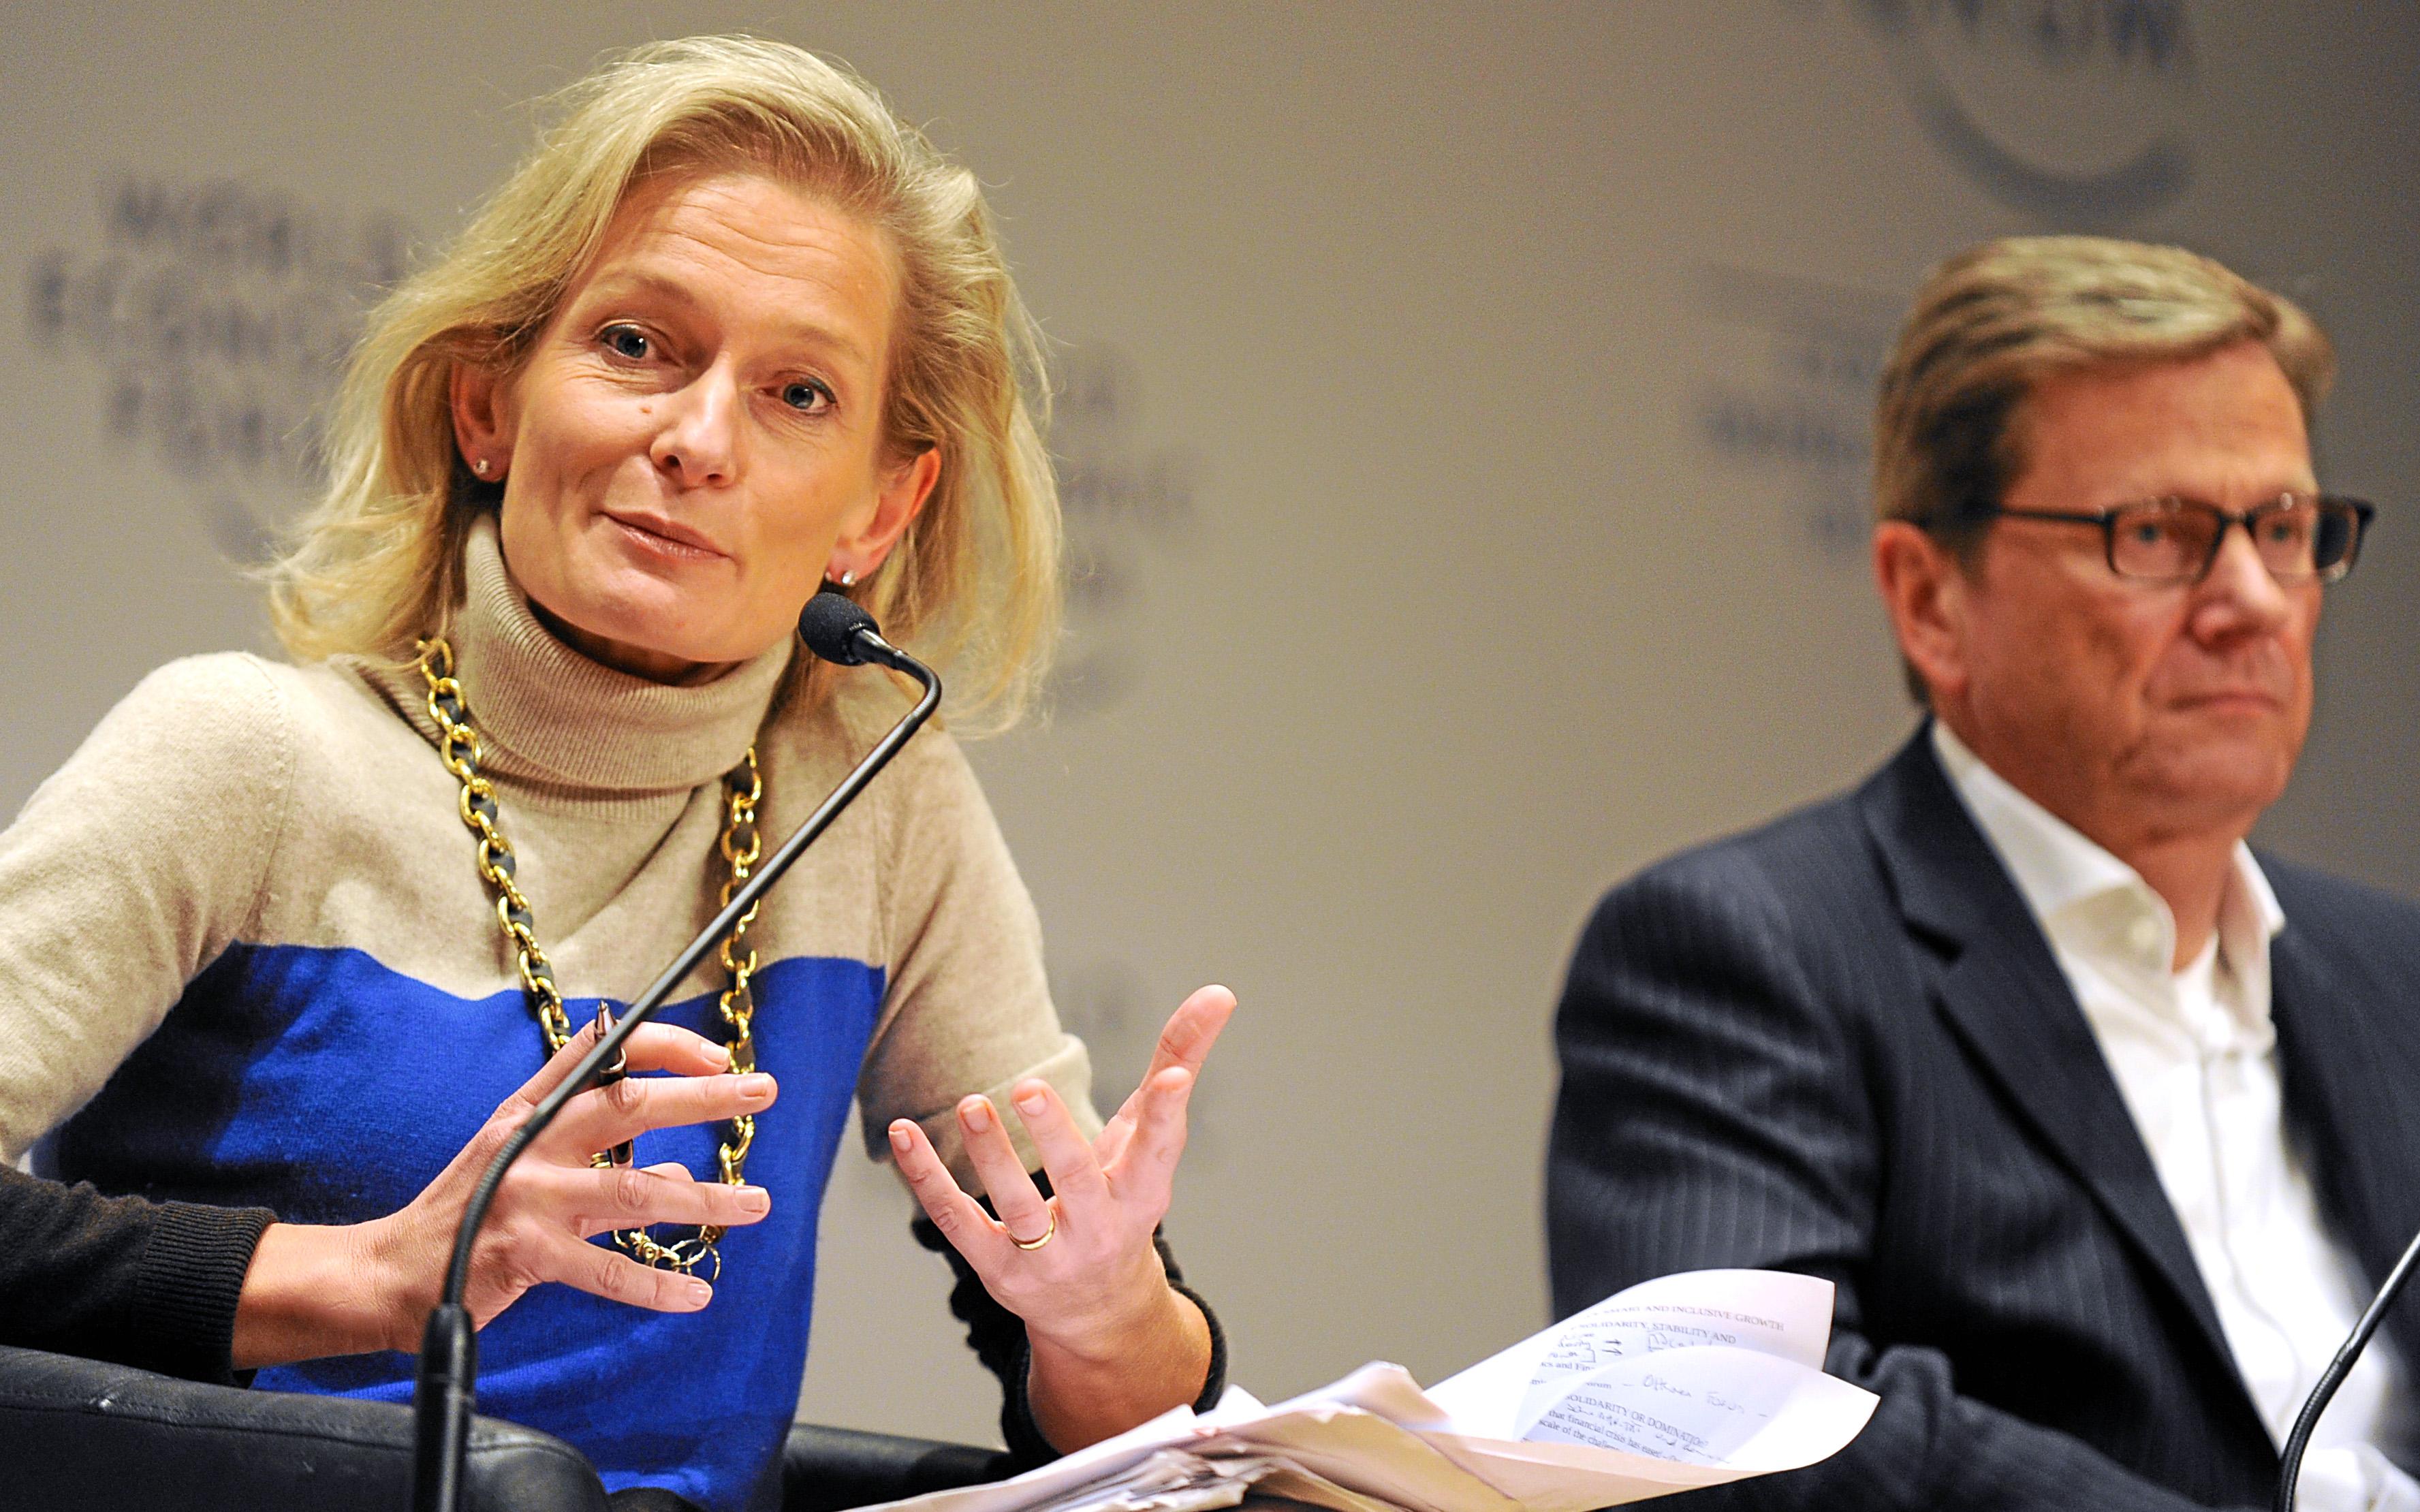 Open Forum: Eurozone - Solidarity or Domination?:  Zanny Minton Beddoes, Guido Westerwelle